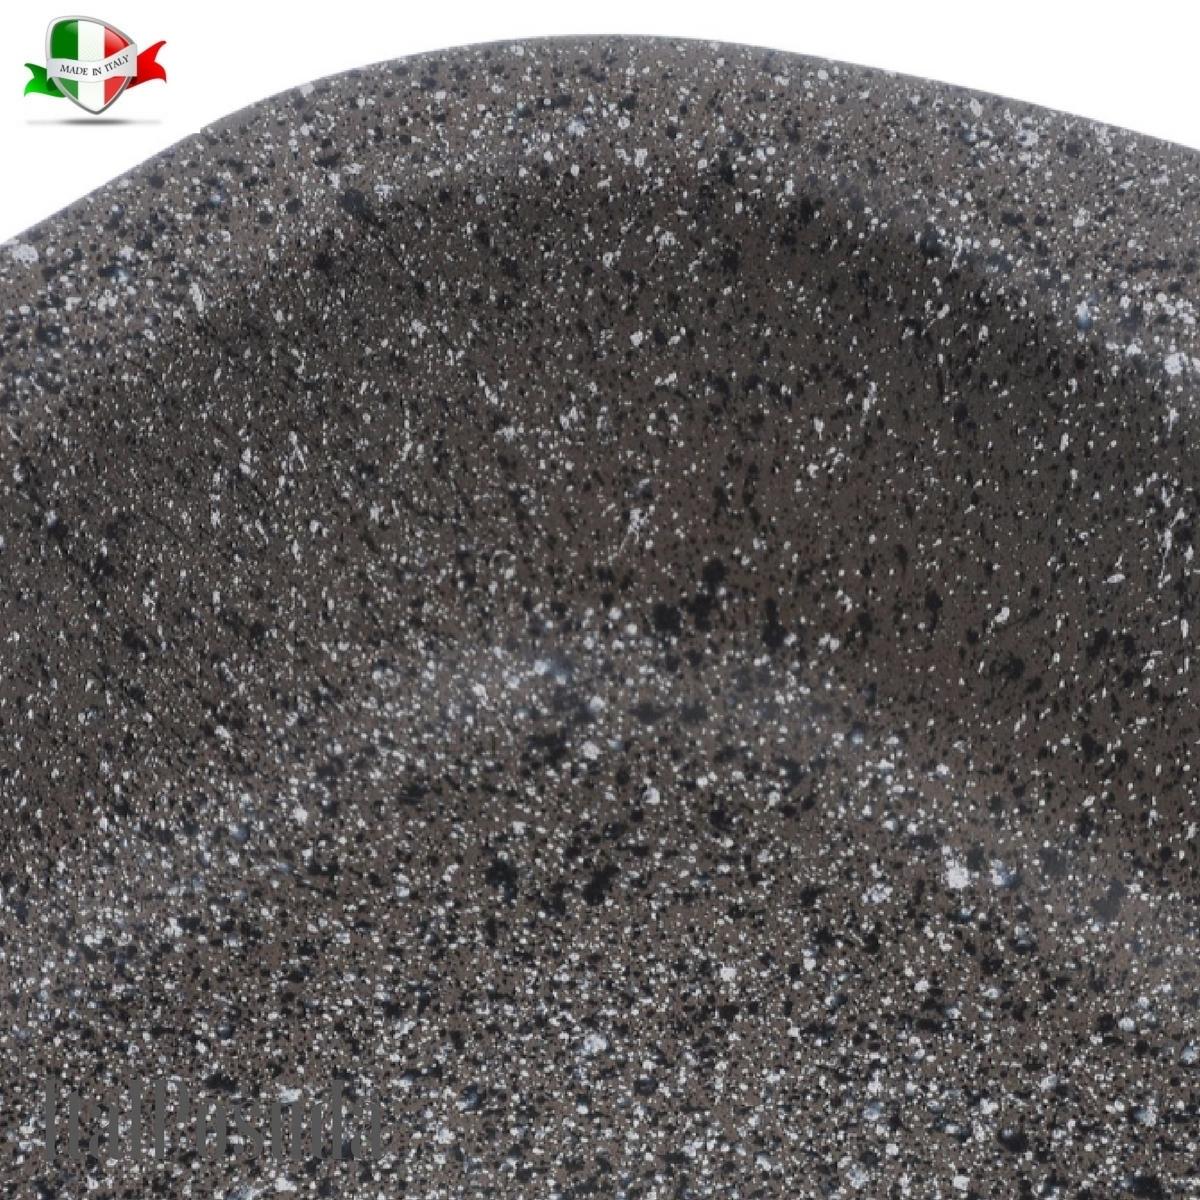 Противень Art Granit 35х27 см, высота 67 мм